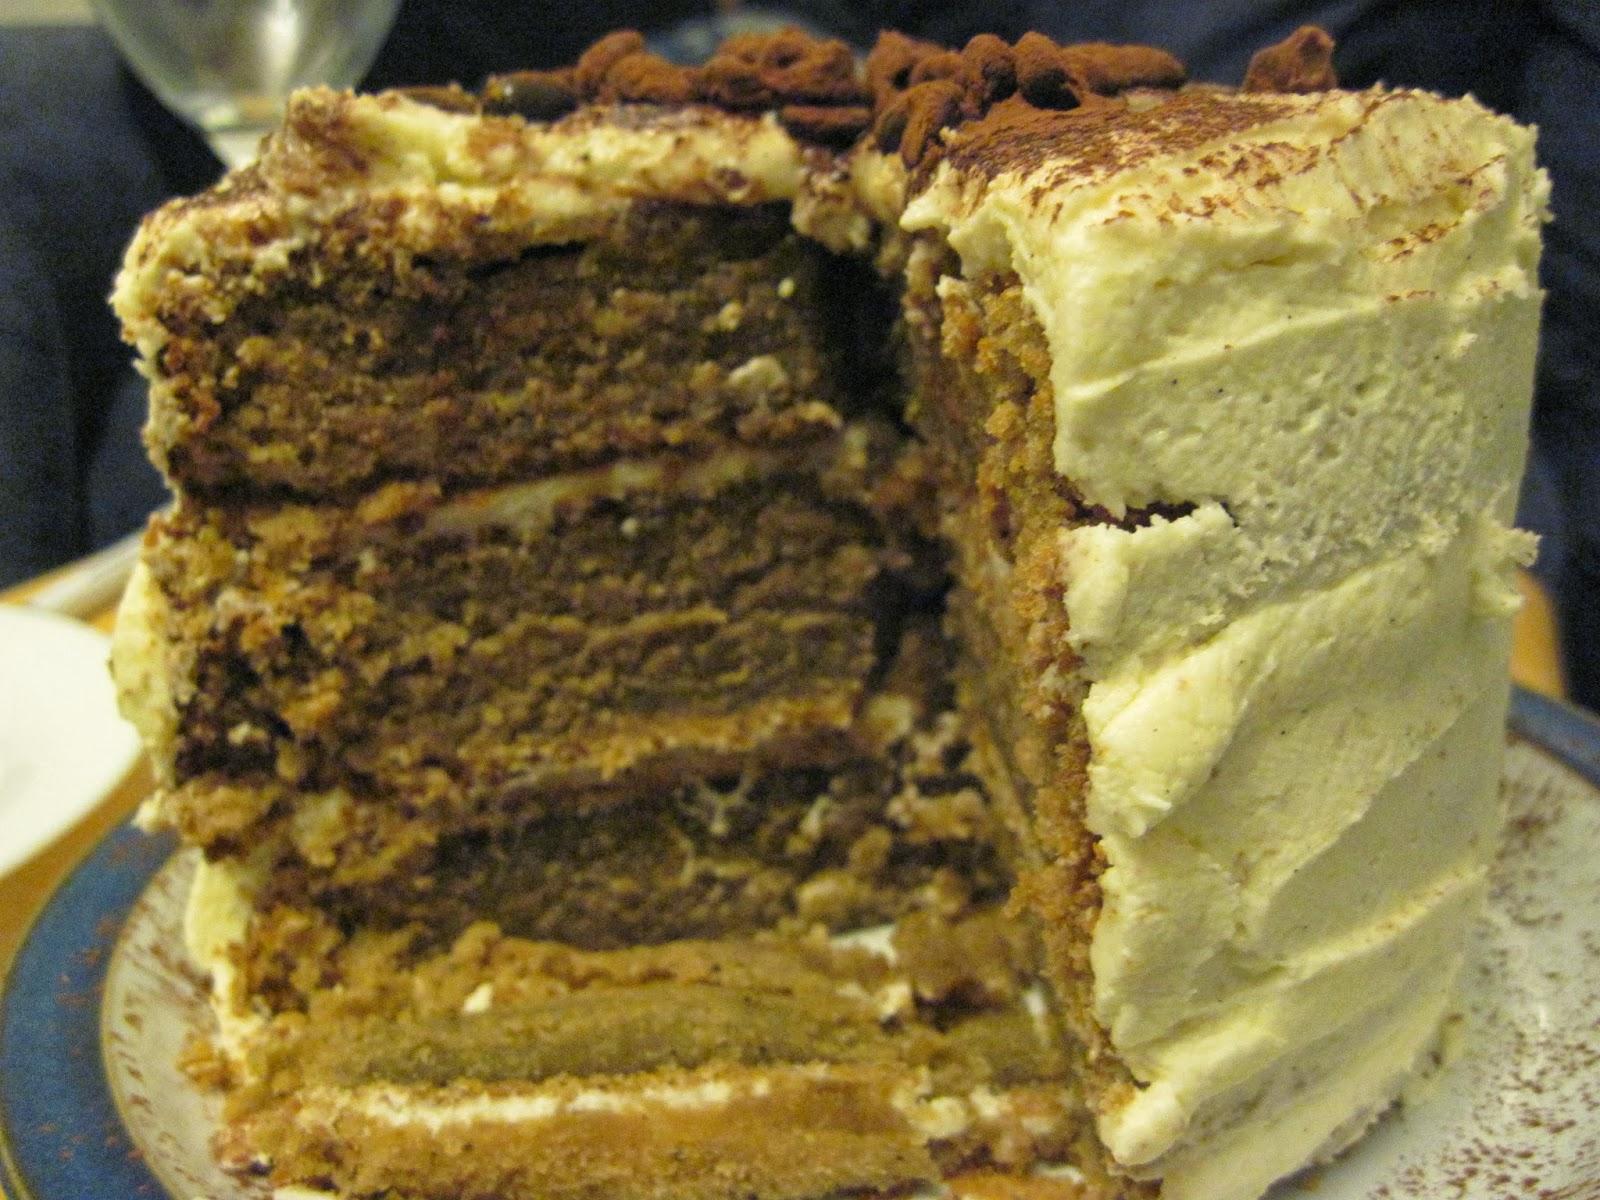 White Chocolate Cake Recipes Uk: The Sugar Lump: White Chocolate Espresso Cake